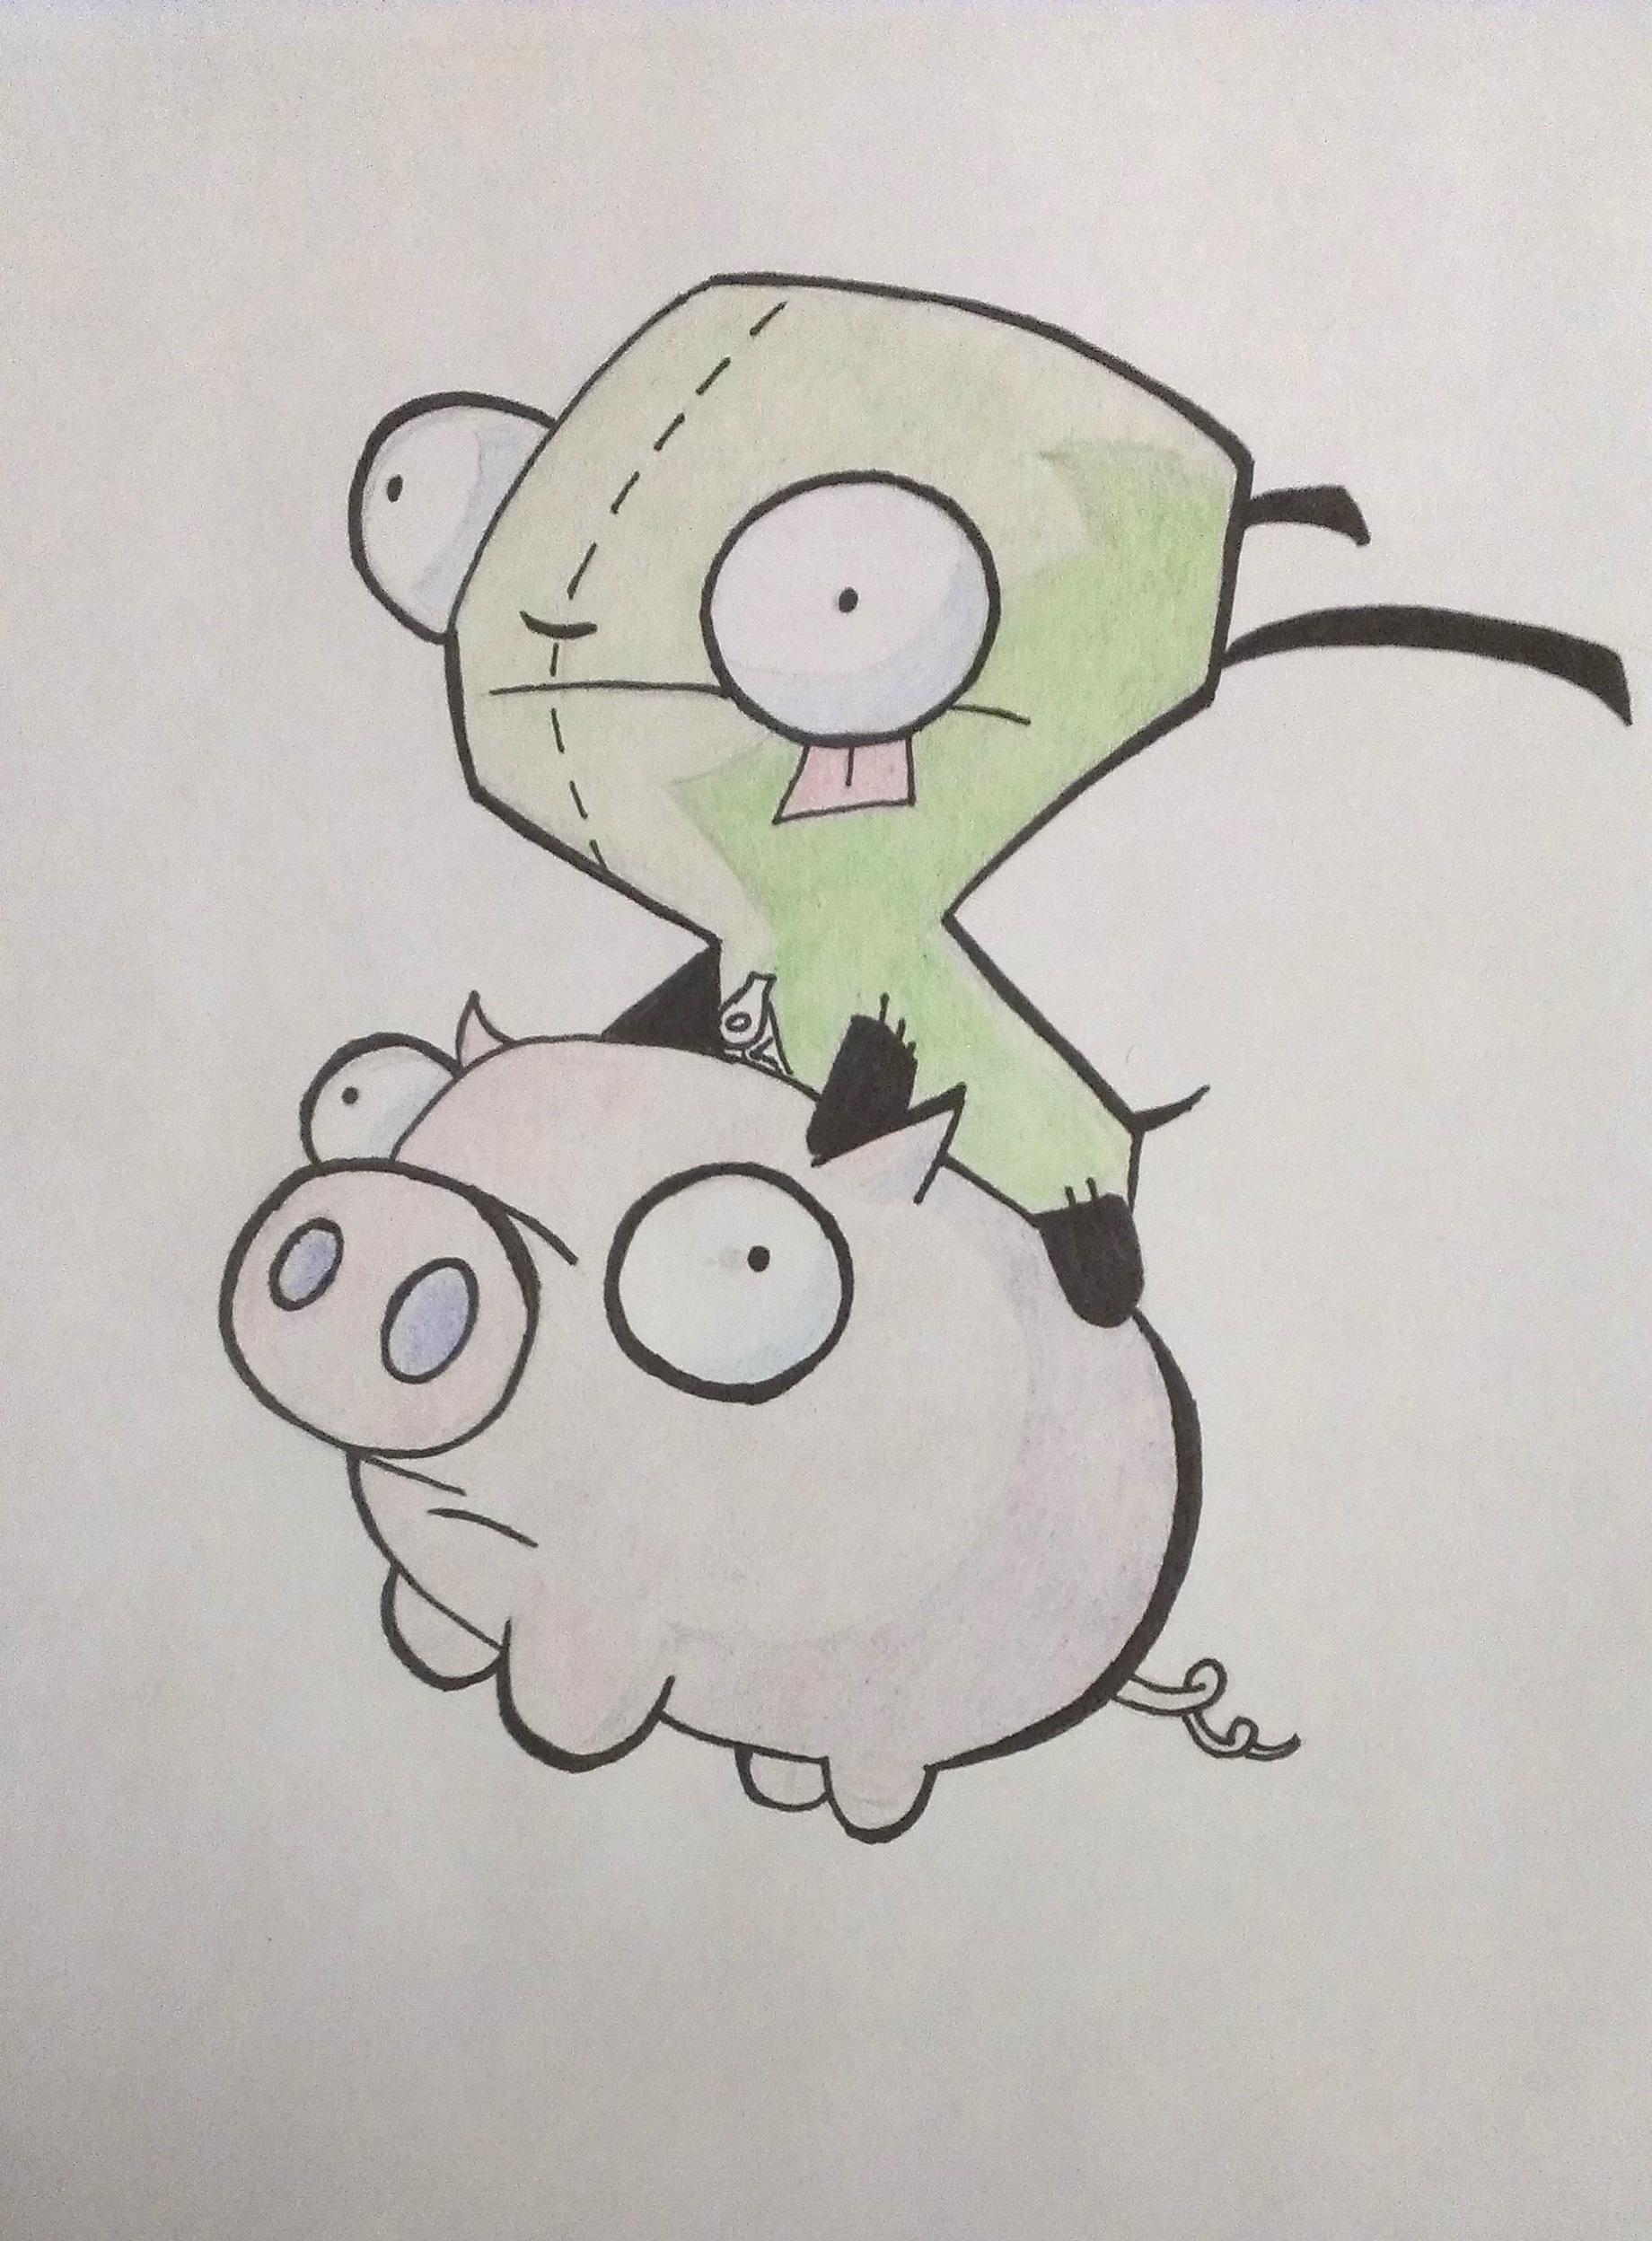 Drawn cartoon sharpie #14